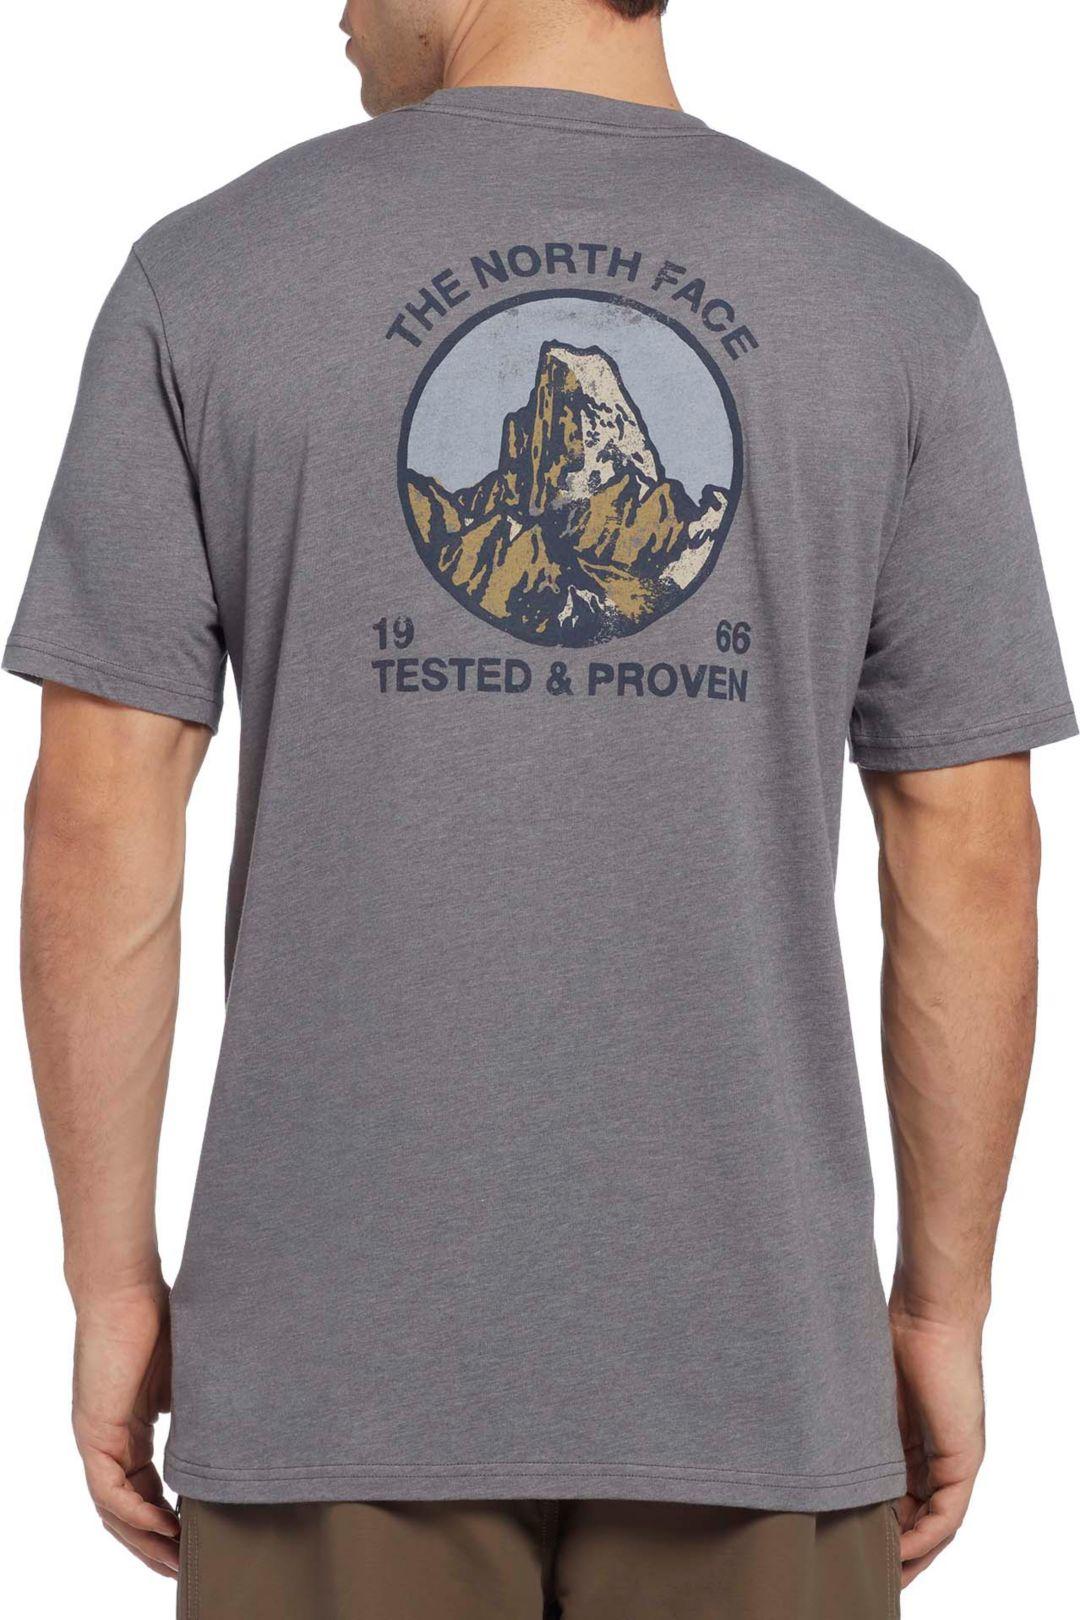 d981d9fd3 The North Face Men's Woodcut T-Shirt